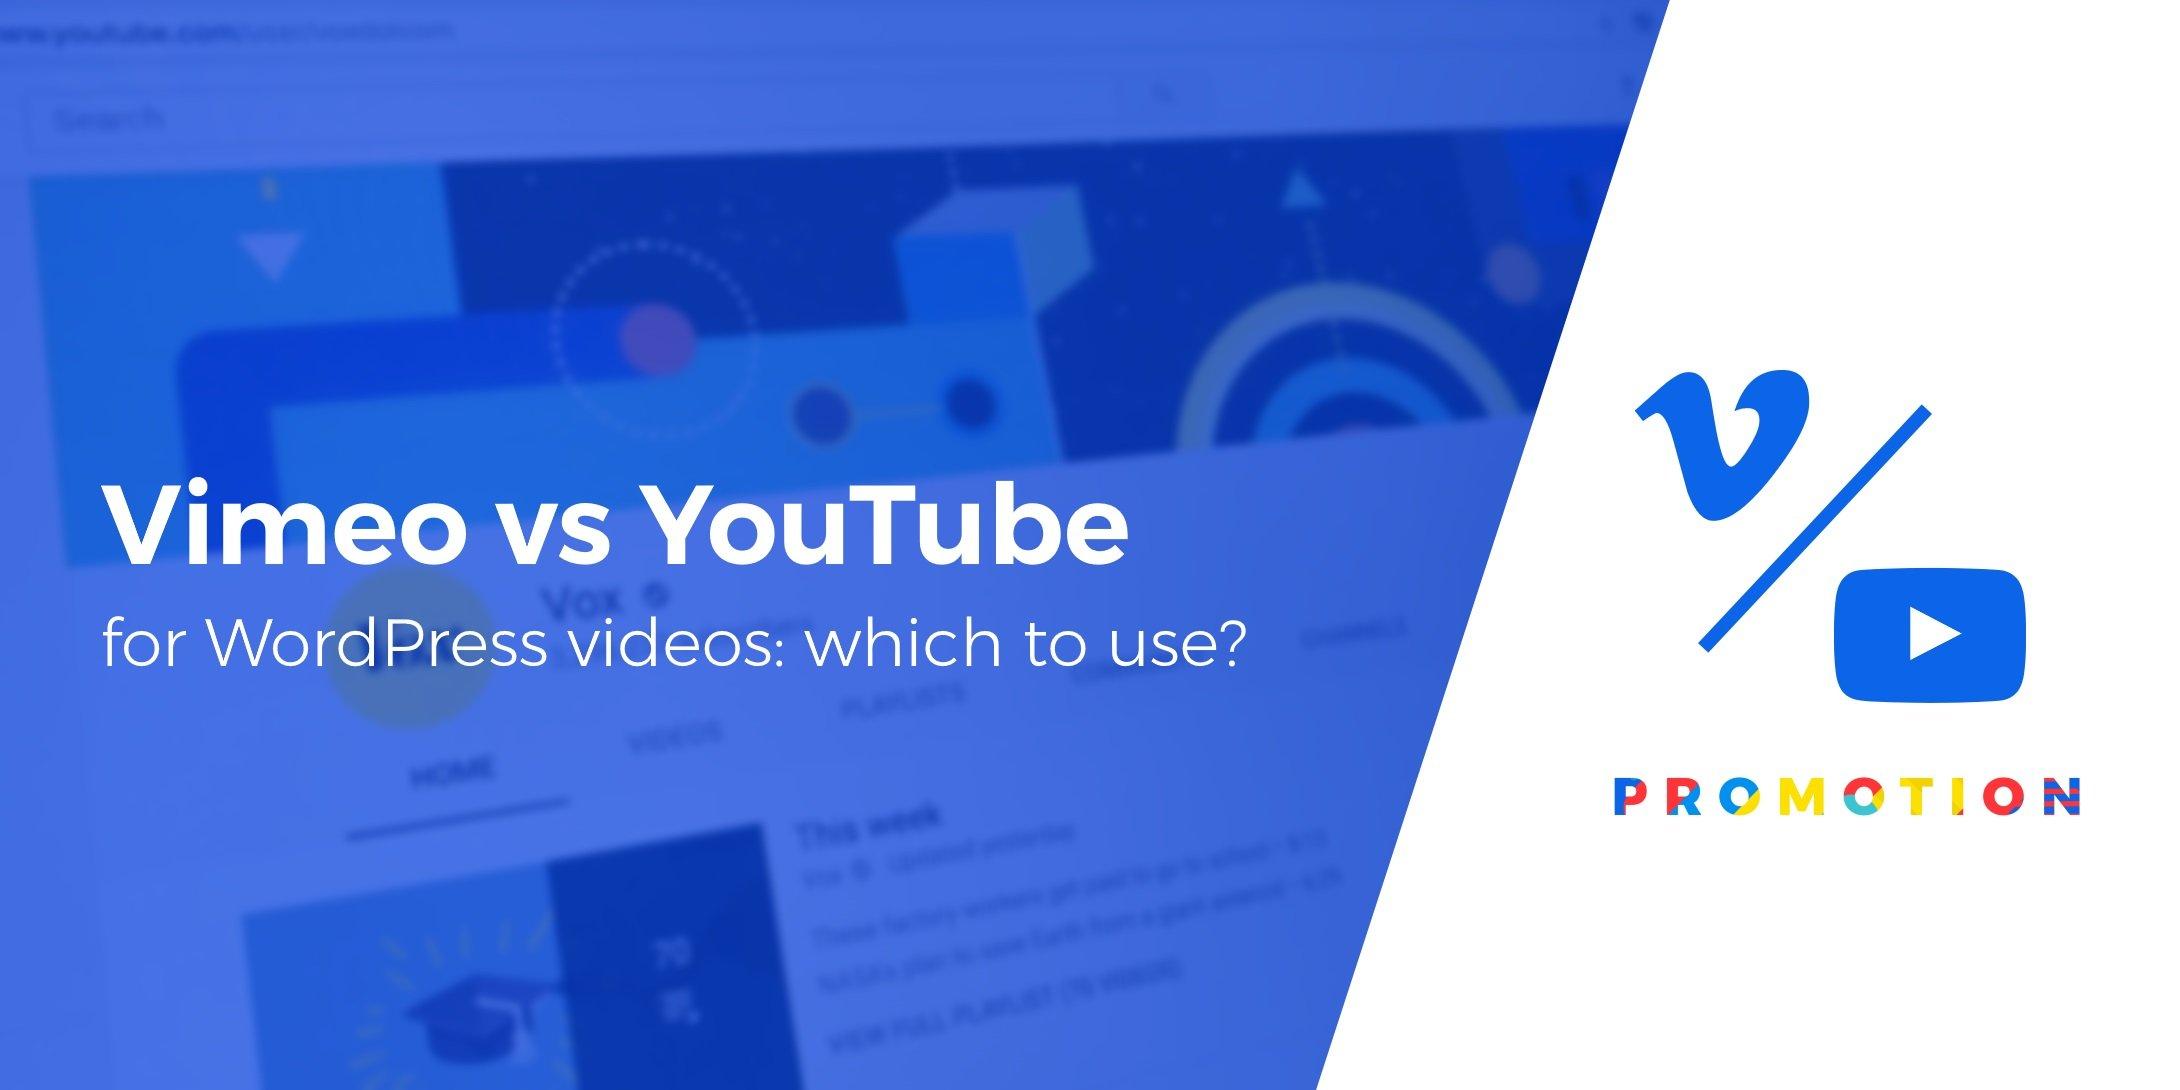 Vimeo vs YouTube for WordPress